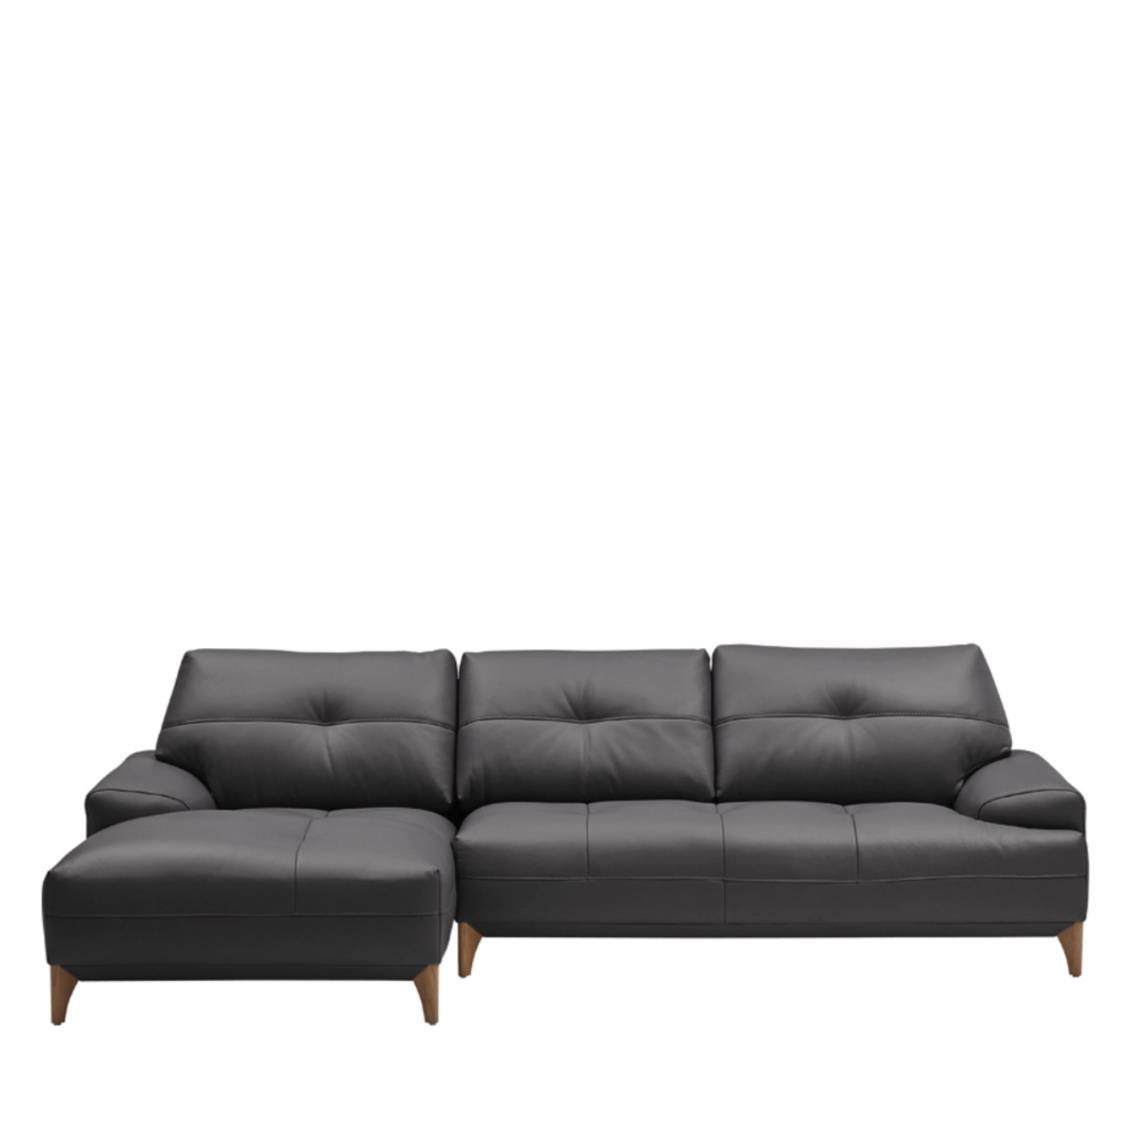 Iloom Boston Leather Couch L L391 Shadow Grey